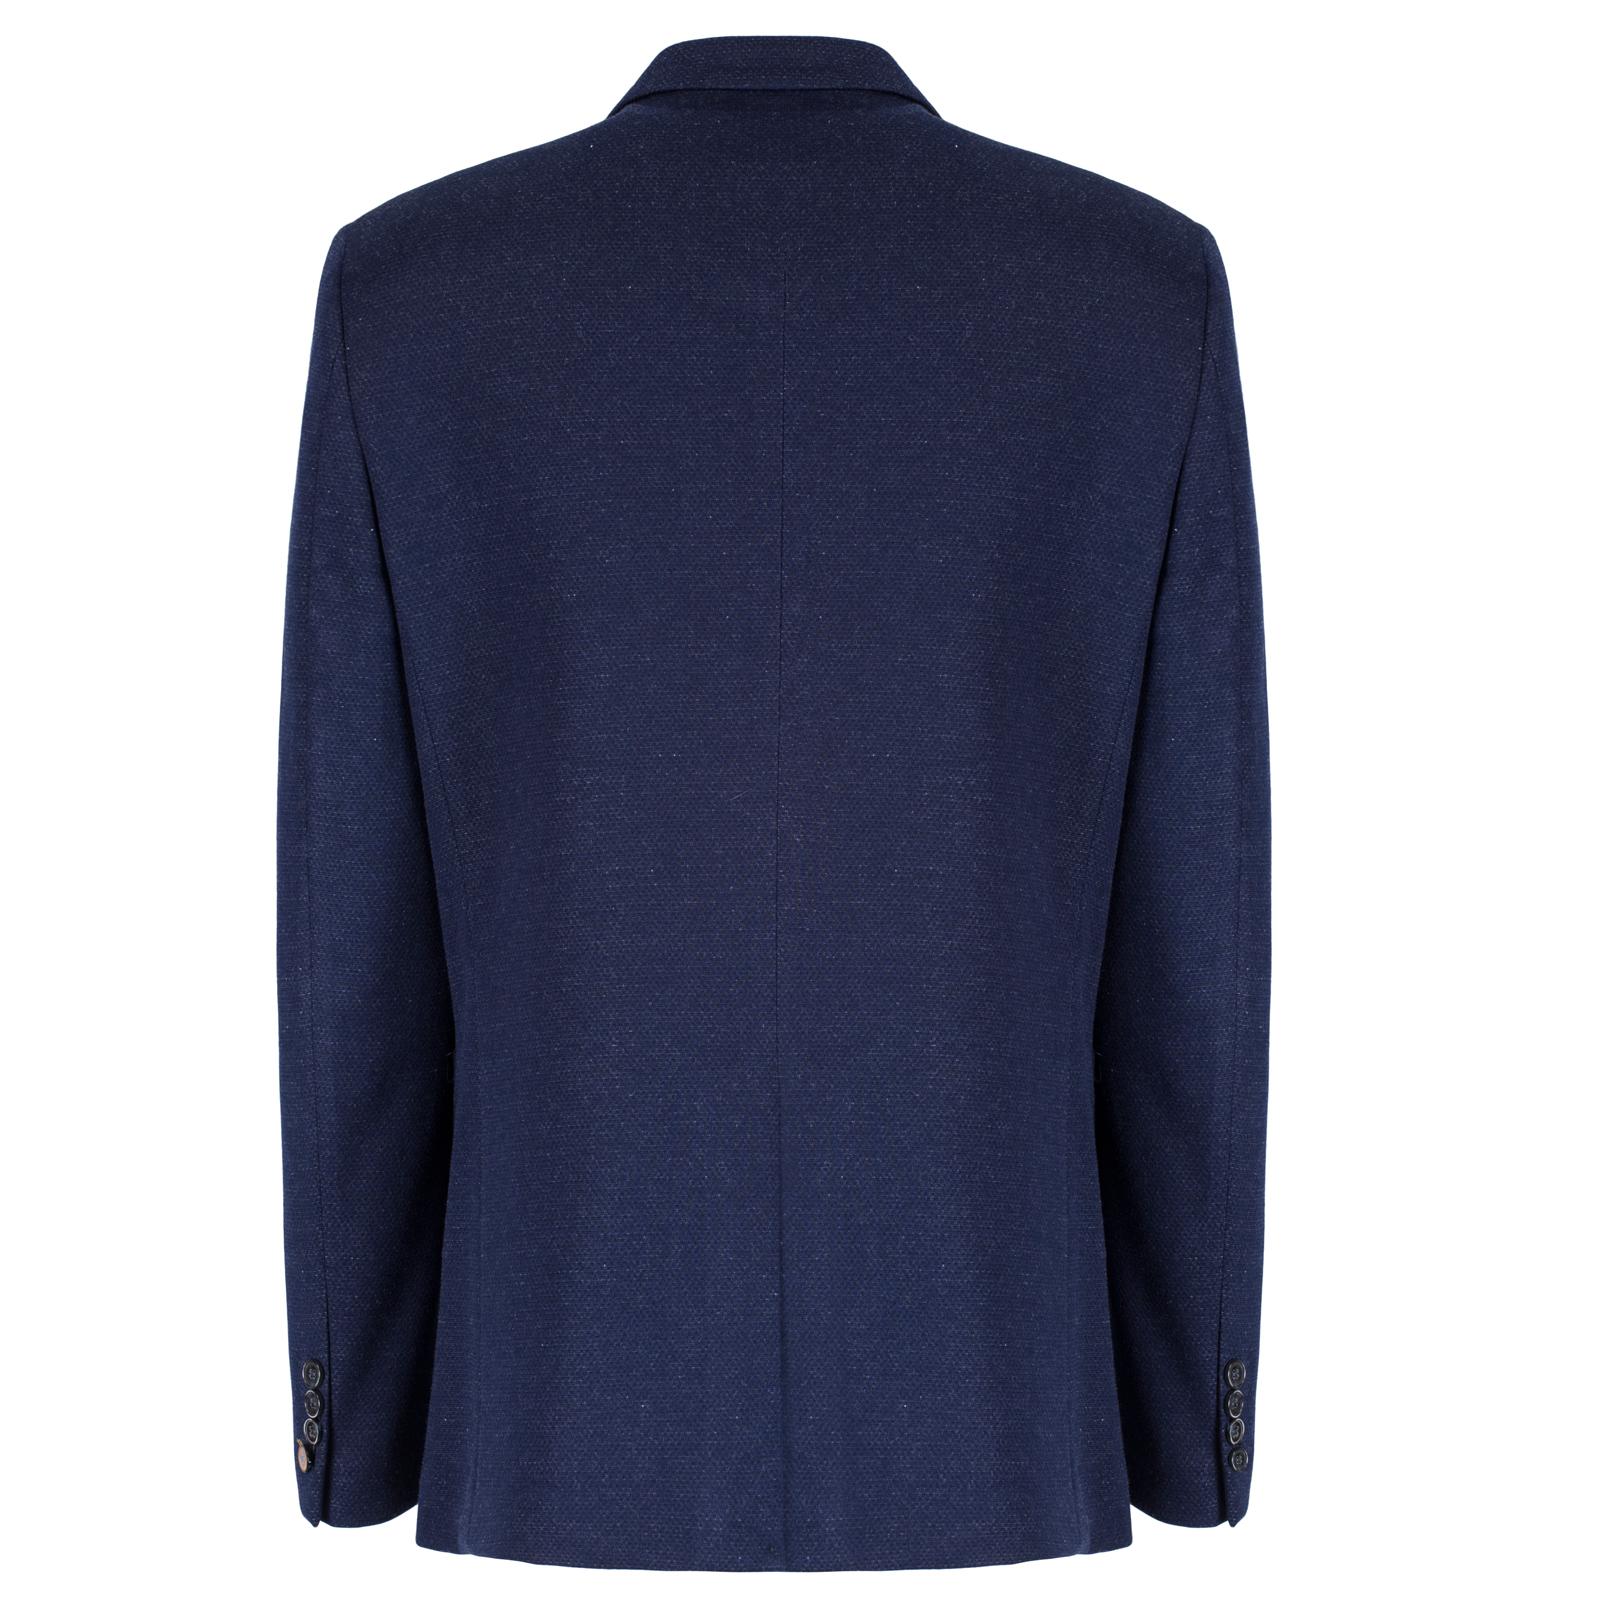 Cavani homme formel blazer homme veste de tailleur en tweed marron bleu coudi res ebay - Blazer homme marron ...